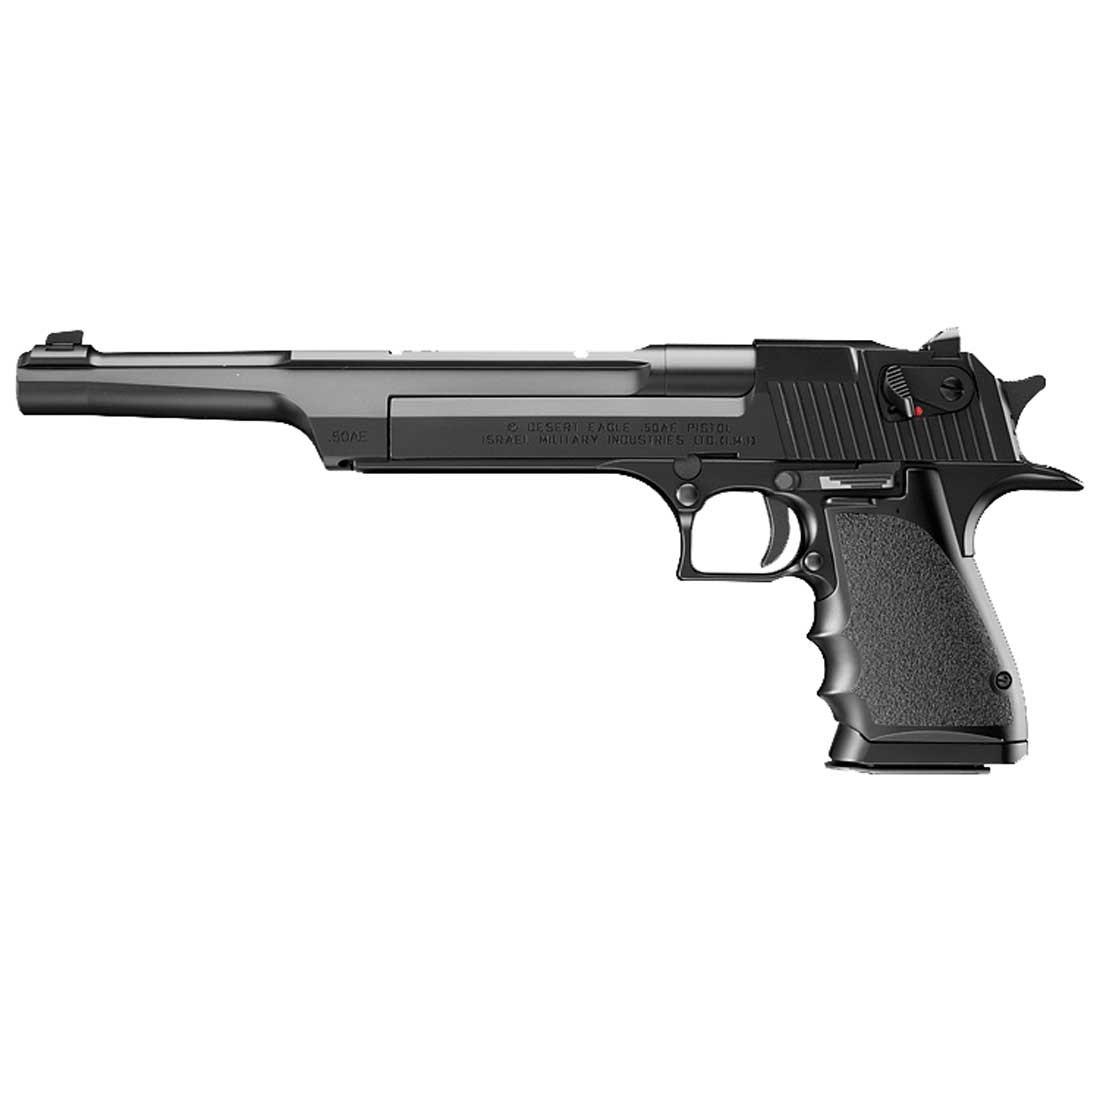 "Tokyo Marui Desert Eagle 10.5"" .50AE GBB Pistol"